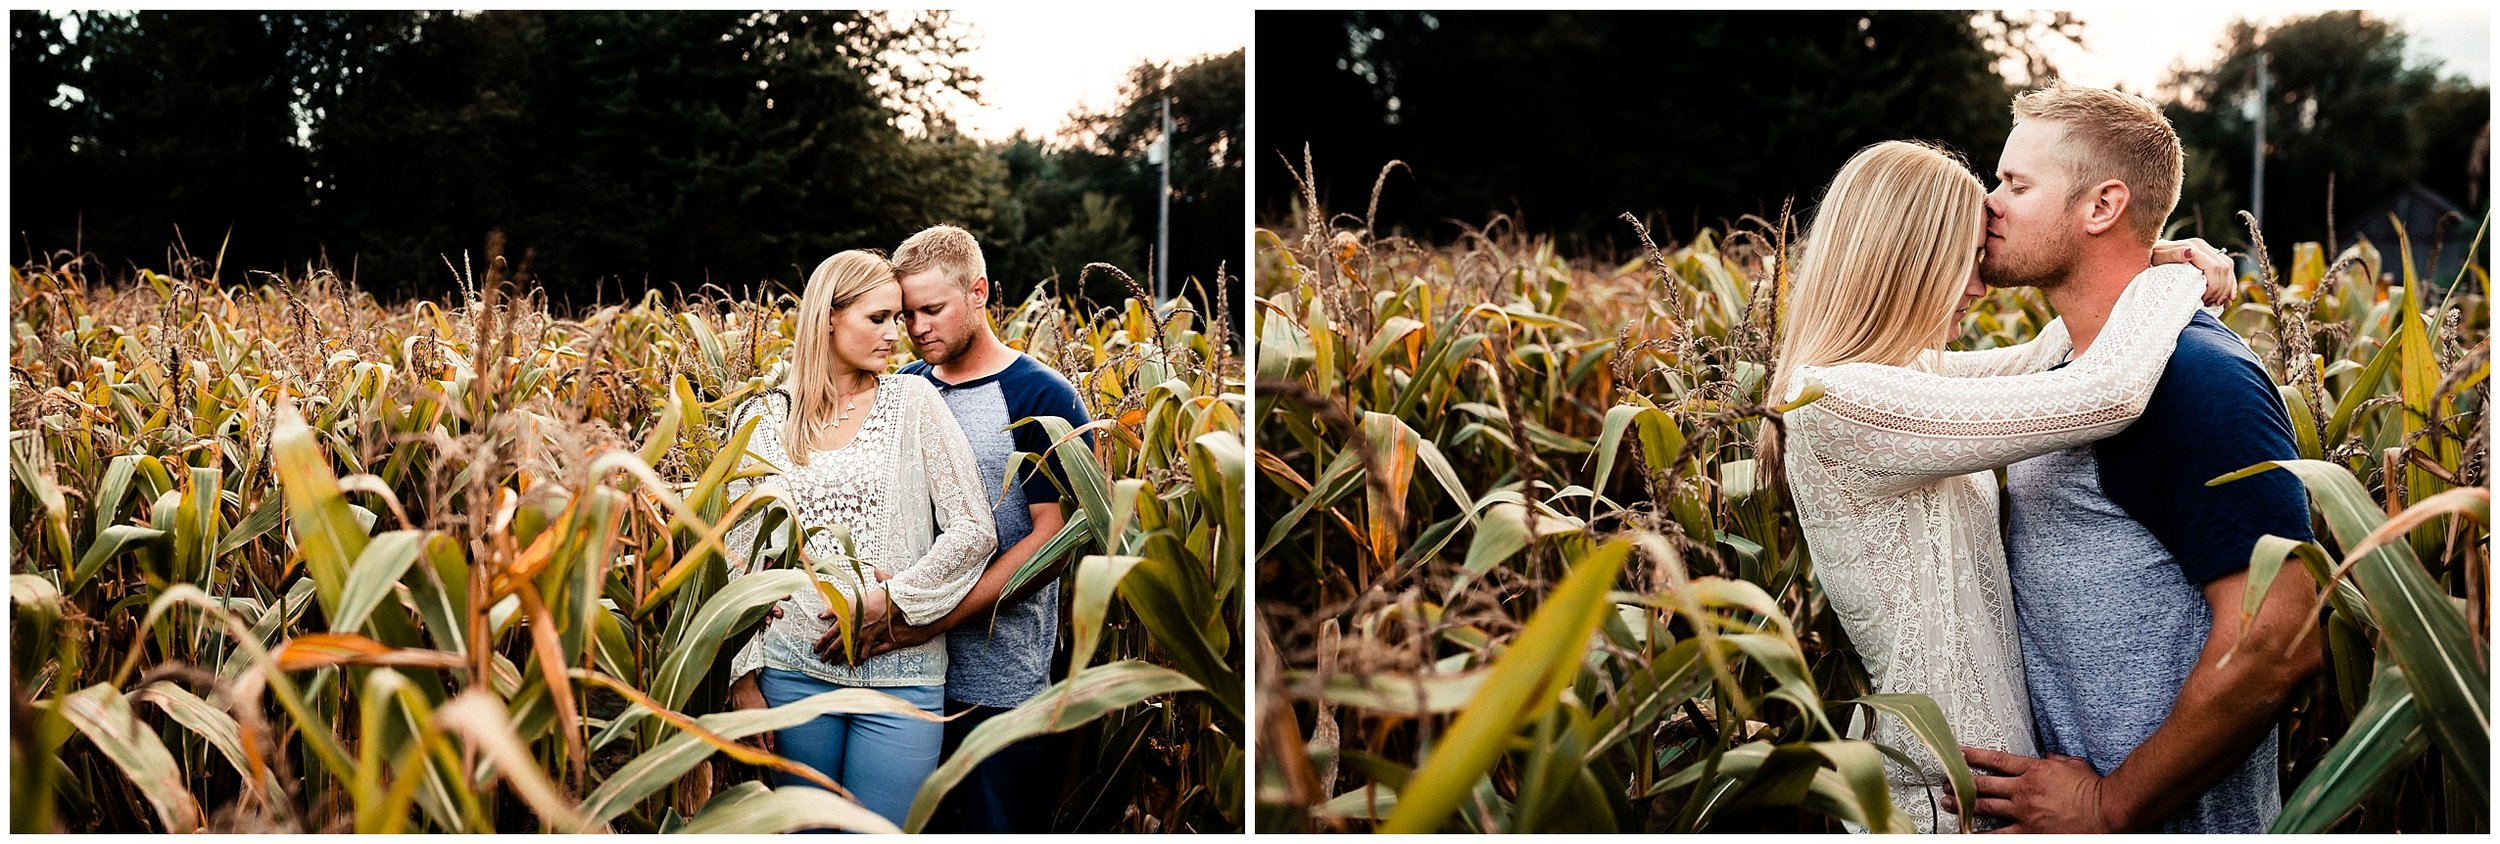 Ben + Haily | Engaged #kyleepaigephotography_1145.jpg